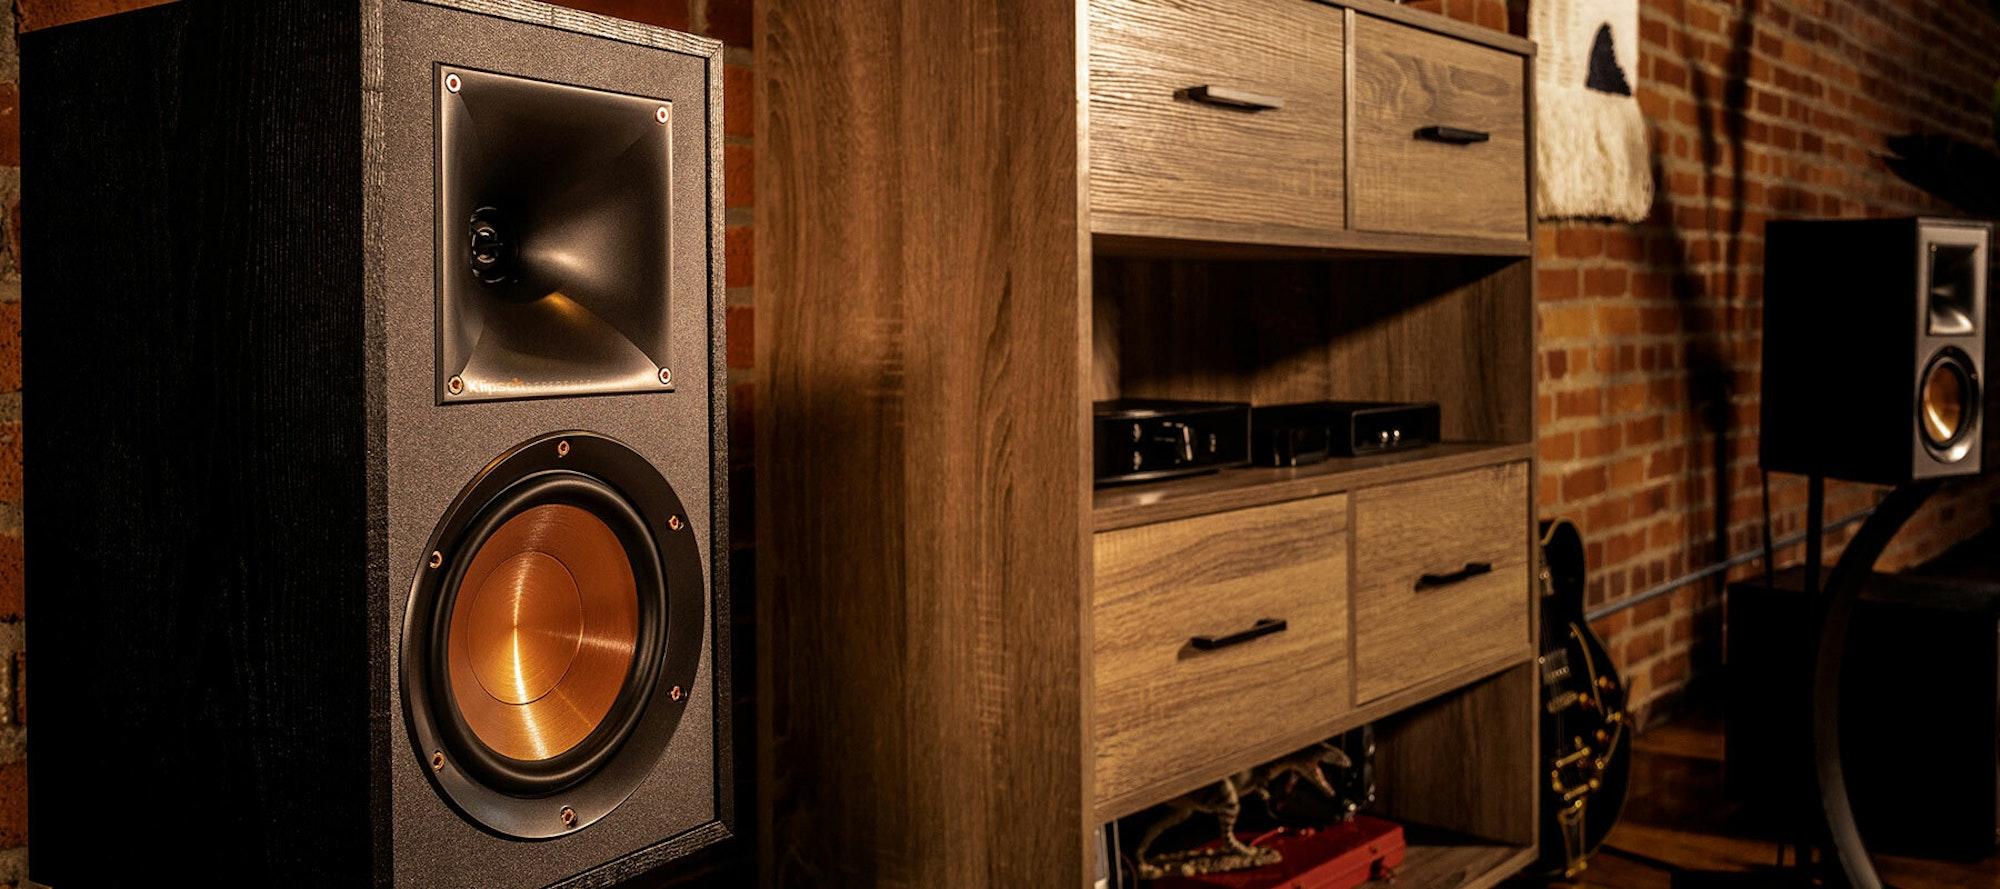 Klipsch bookshelf speakers home setup next to brick wall